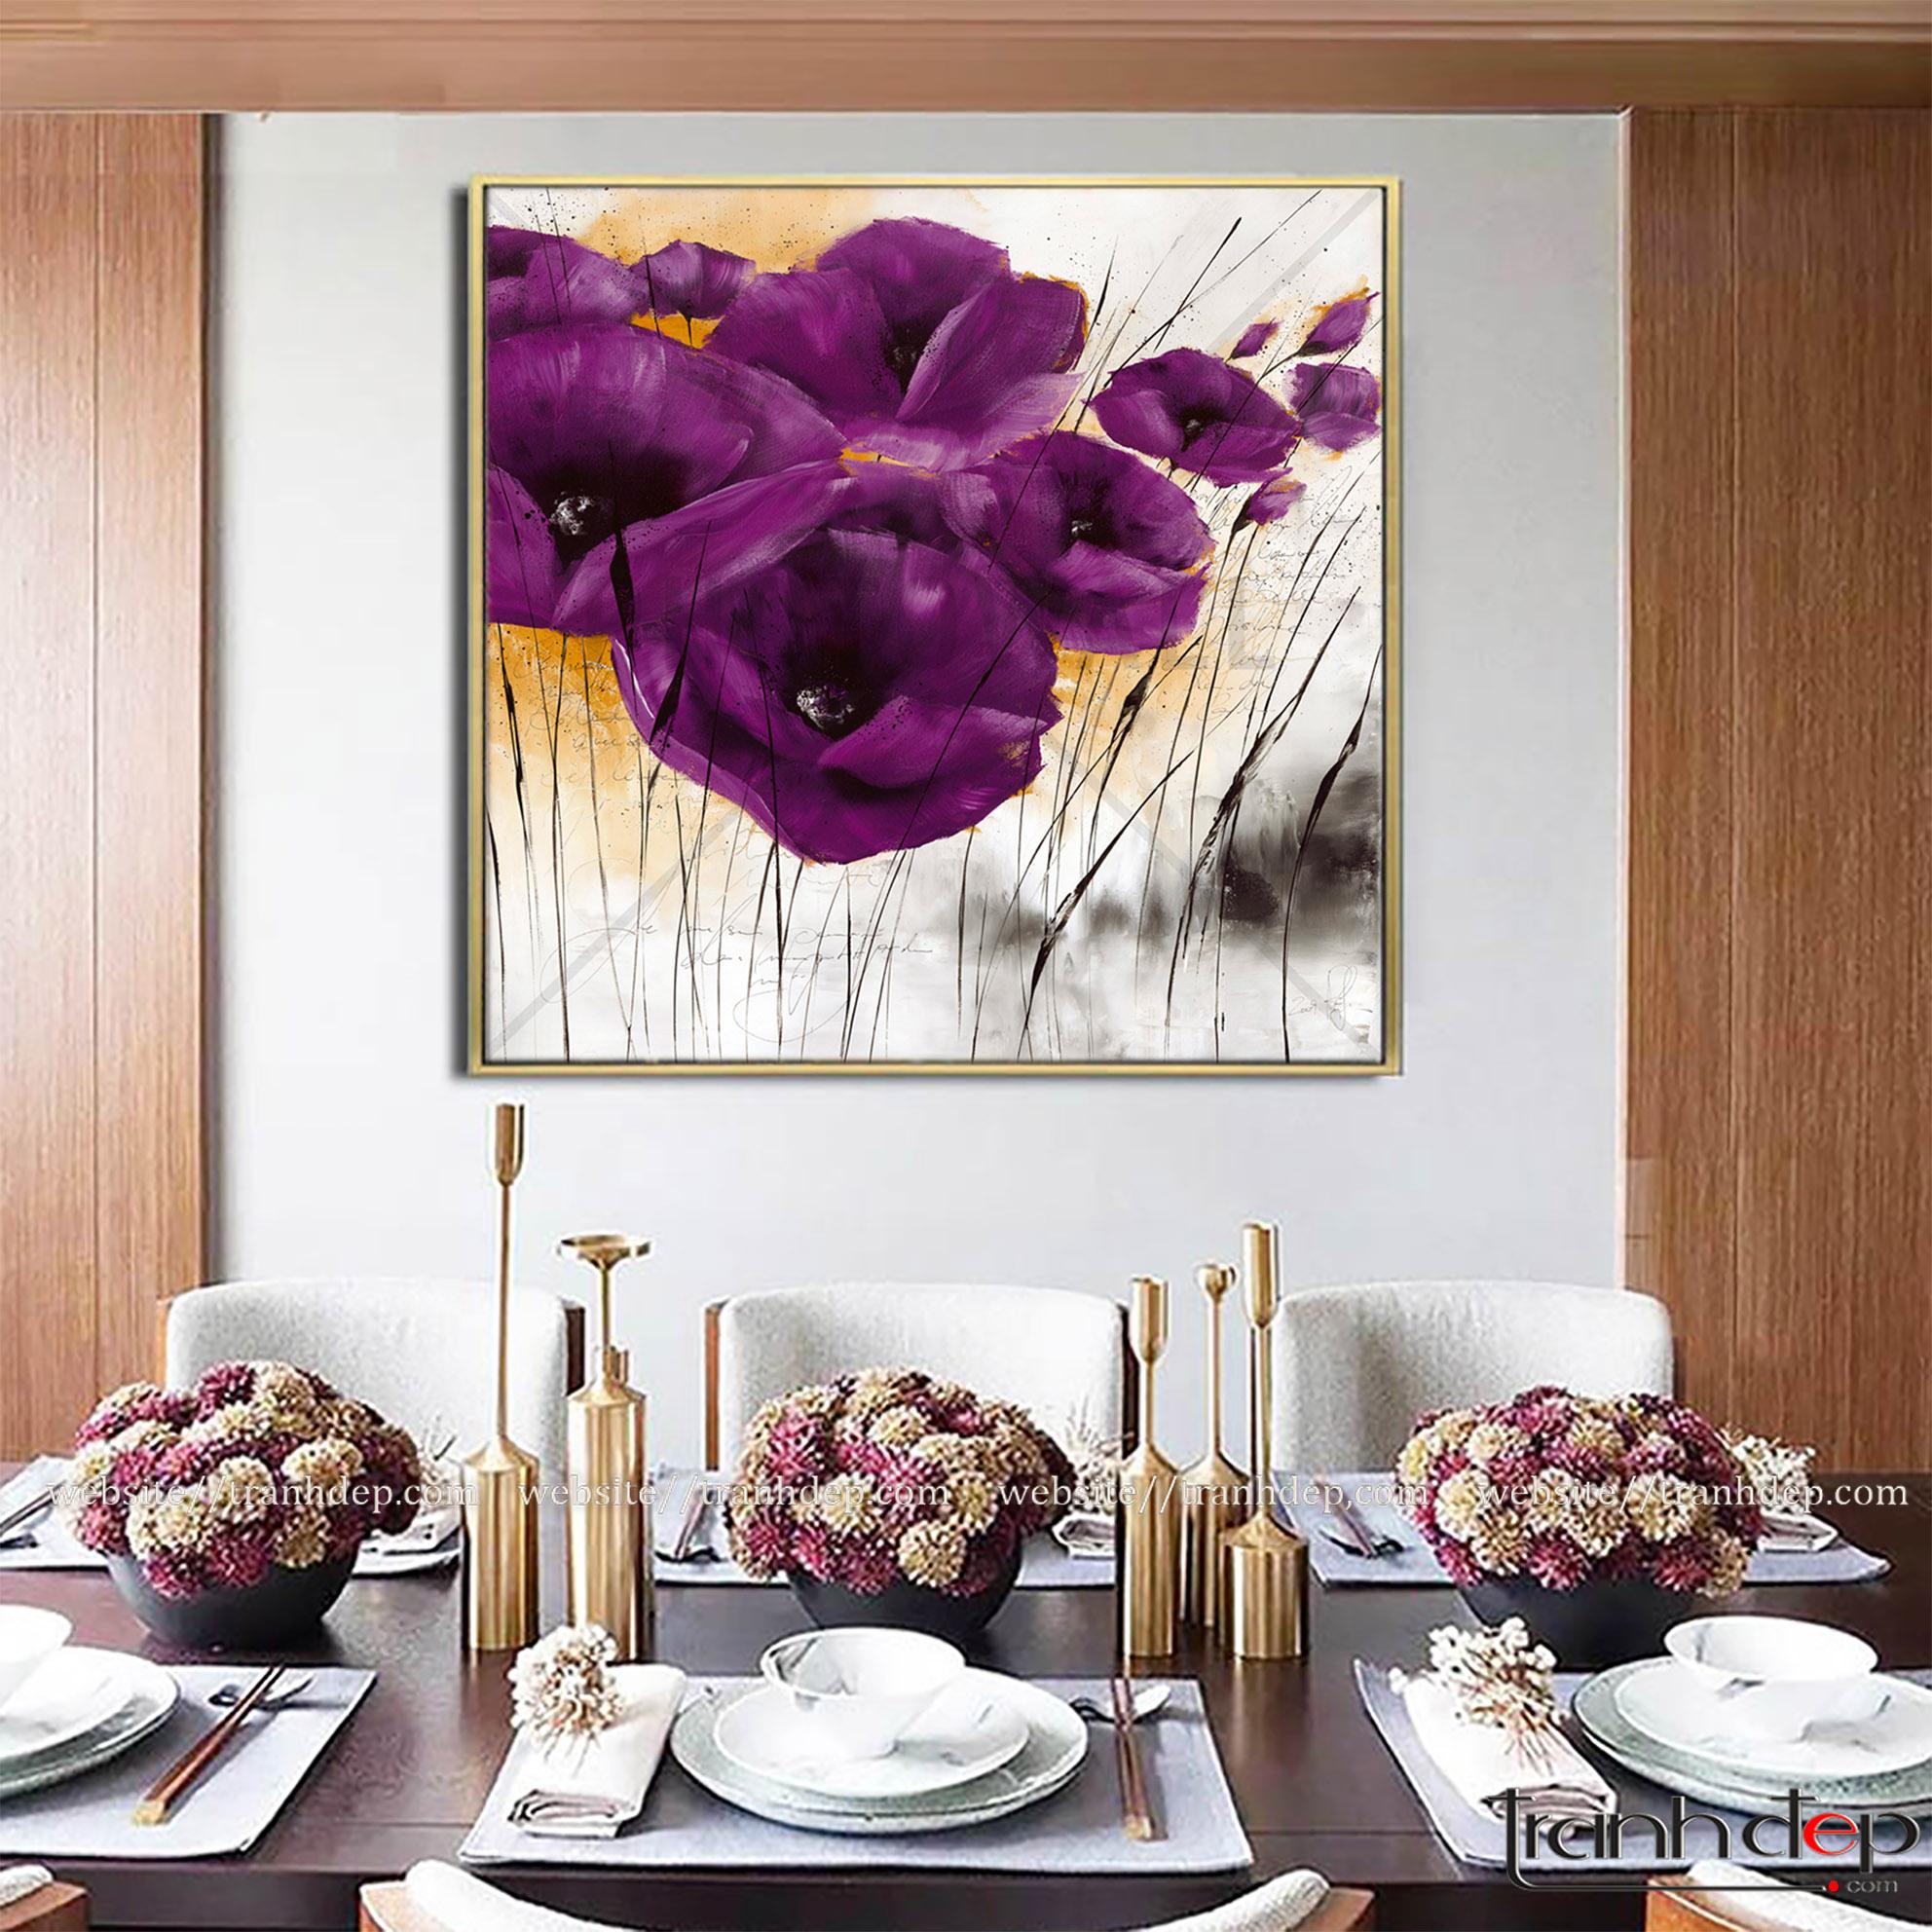 tranh tặng tân gia - tranh hoa poppy